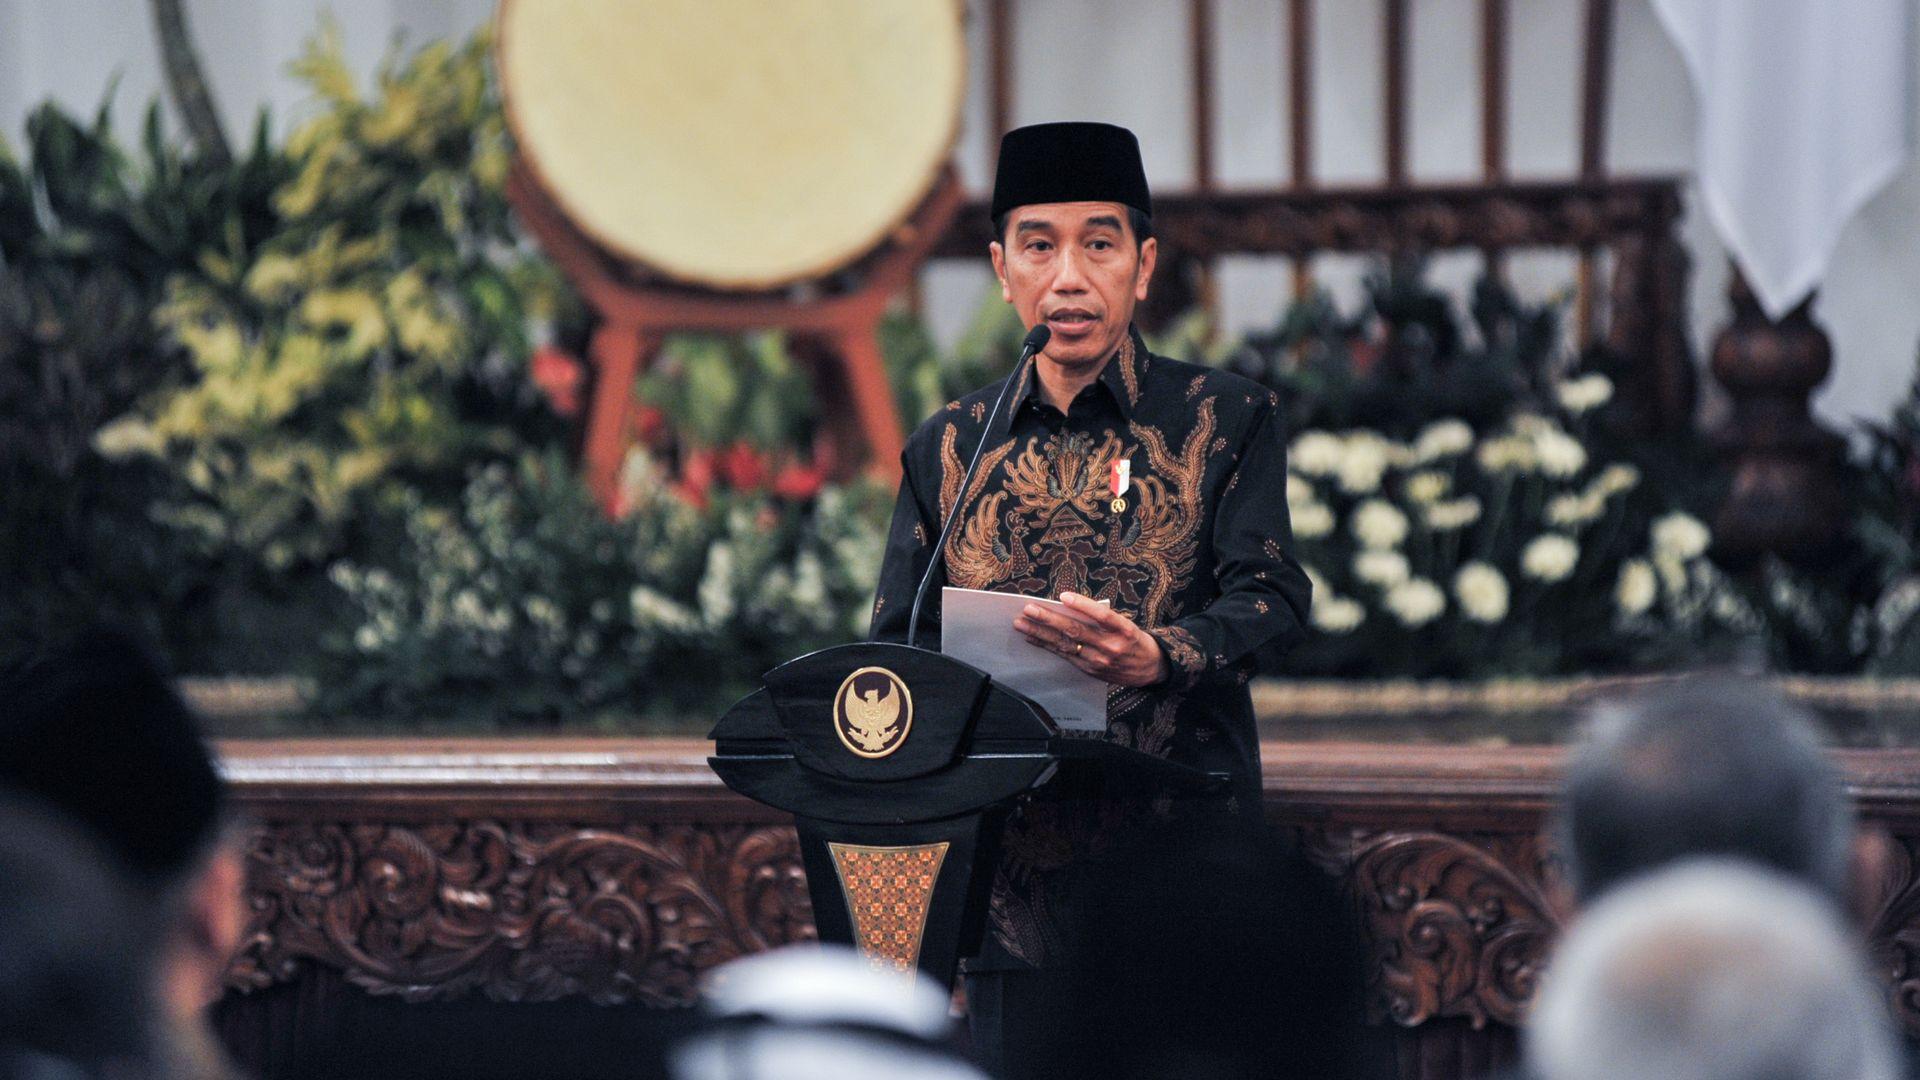 Indonesian President Joko Widodo speechs during Nuzulul Quran event at Presidential Merdeka Palace in Jakarta, Indonesia on June 5, 2018.